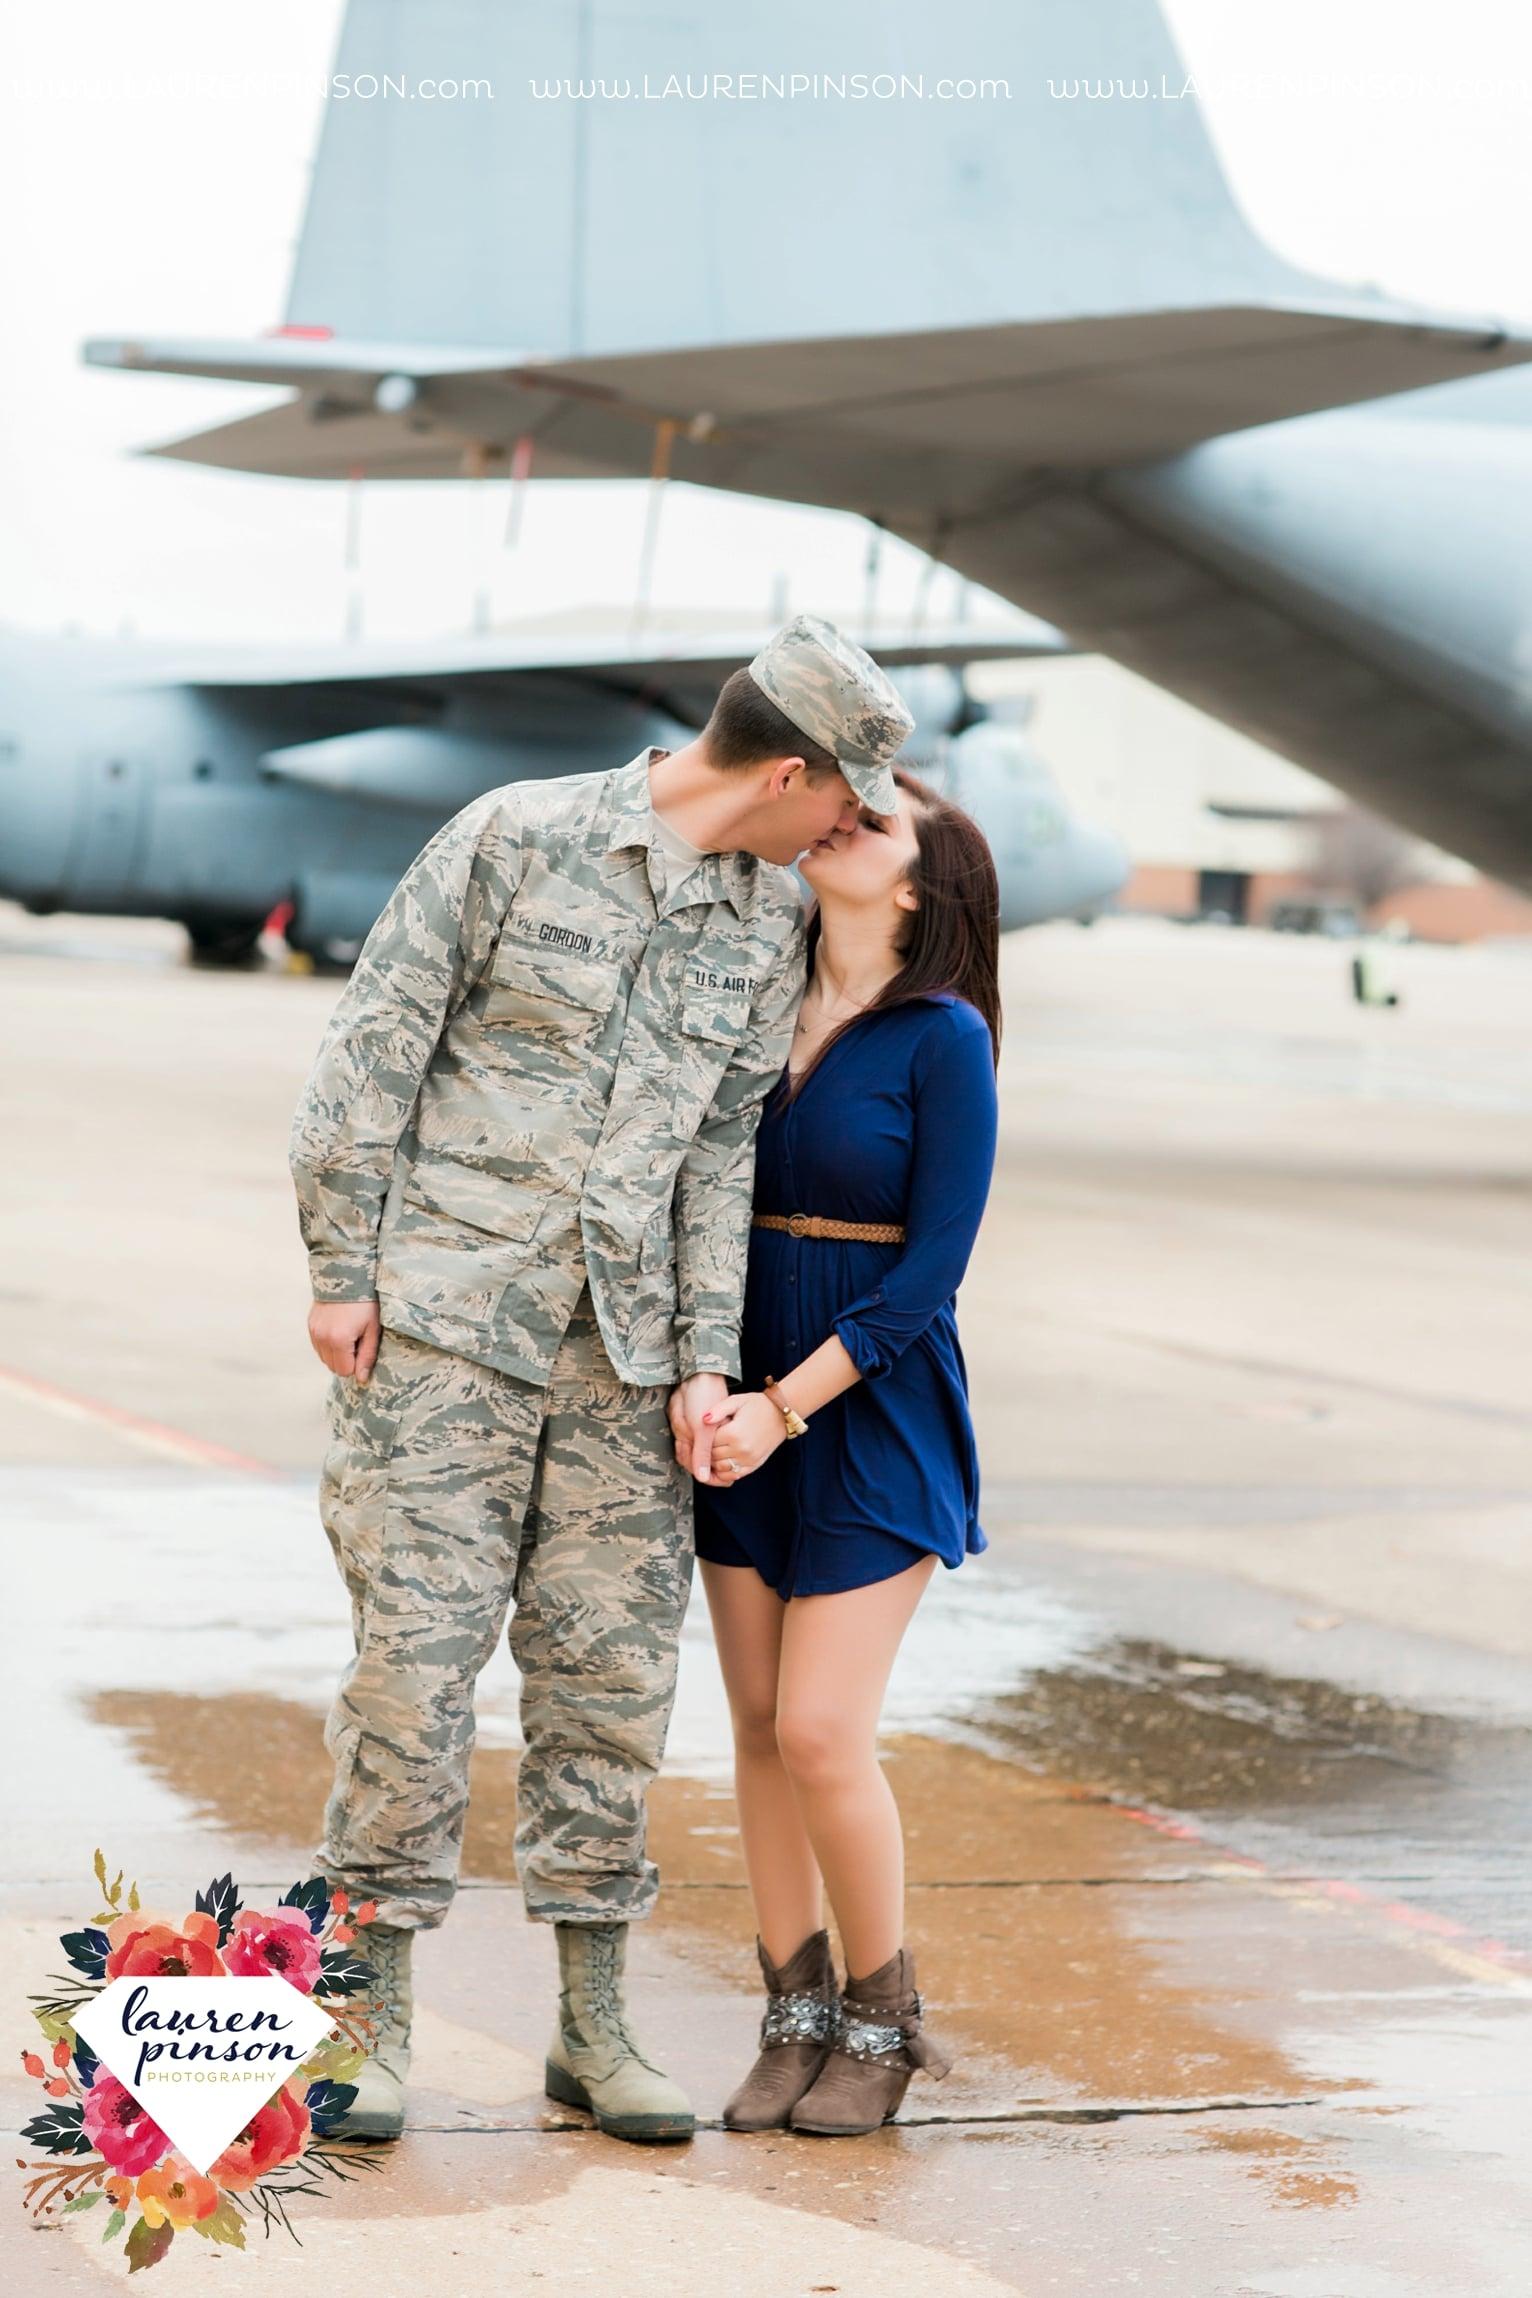 sheppard-afb-wichita-falls-engagement-session-airmen-in-uniform-abu-airplanes-bride-engagement-ring-texas-air-force-base_2001.jpg